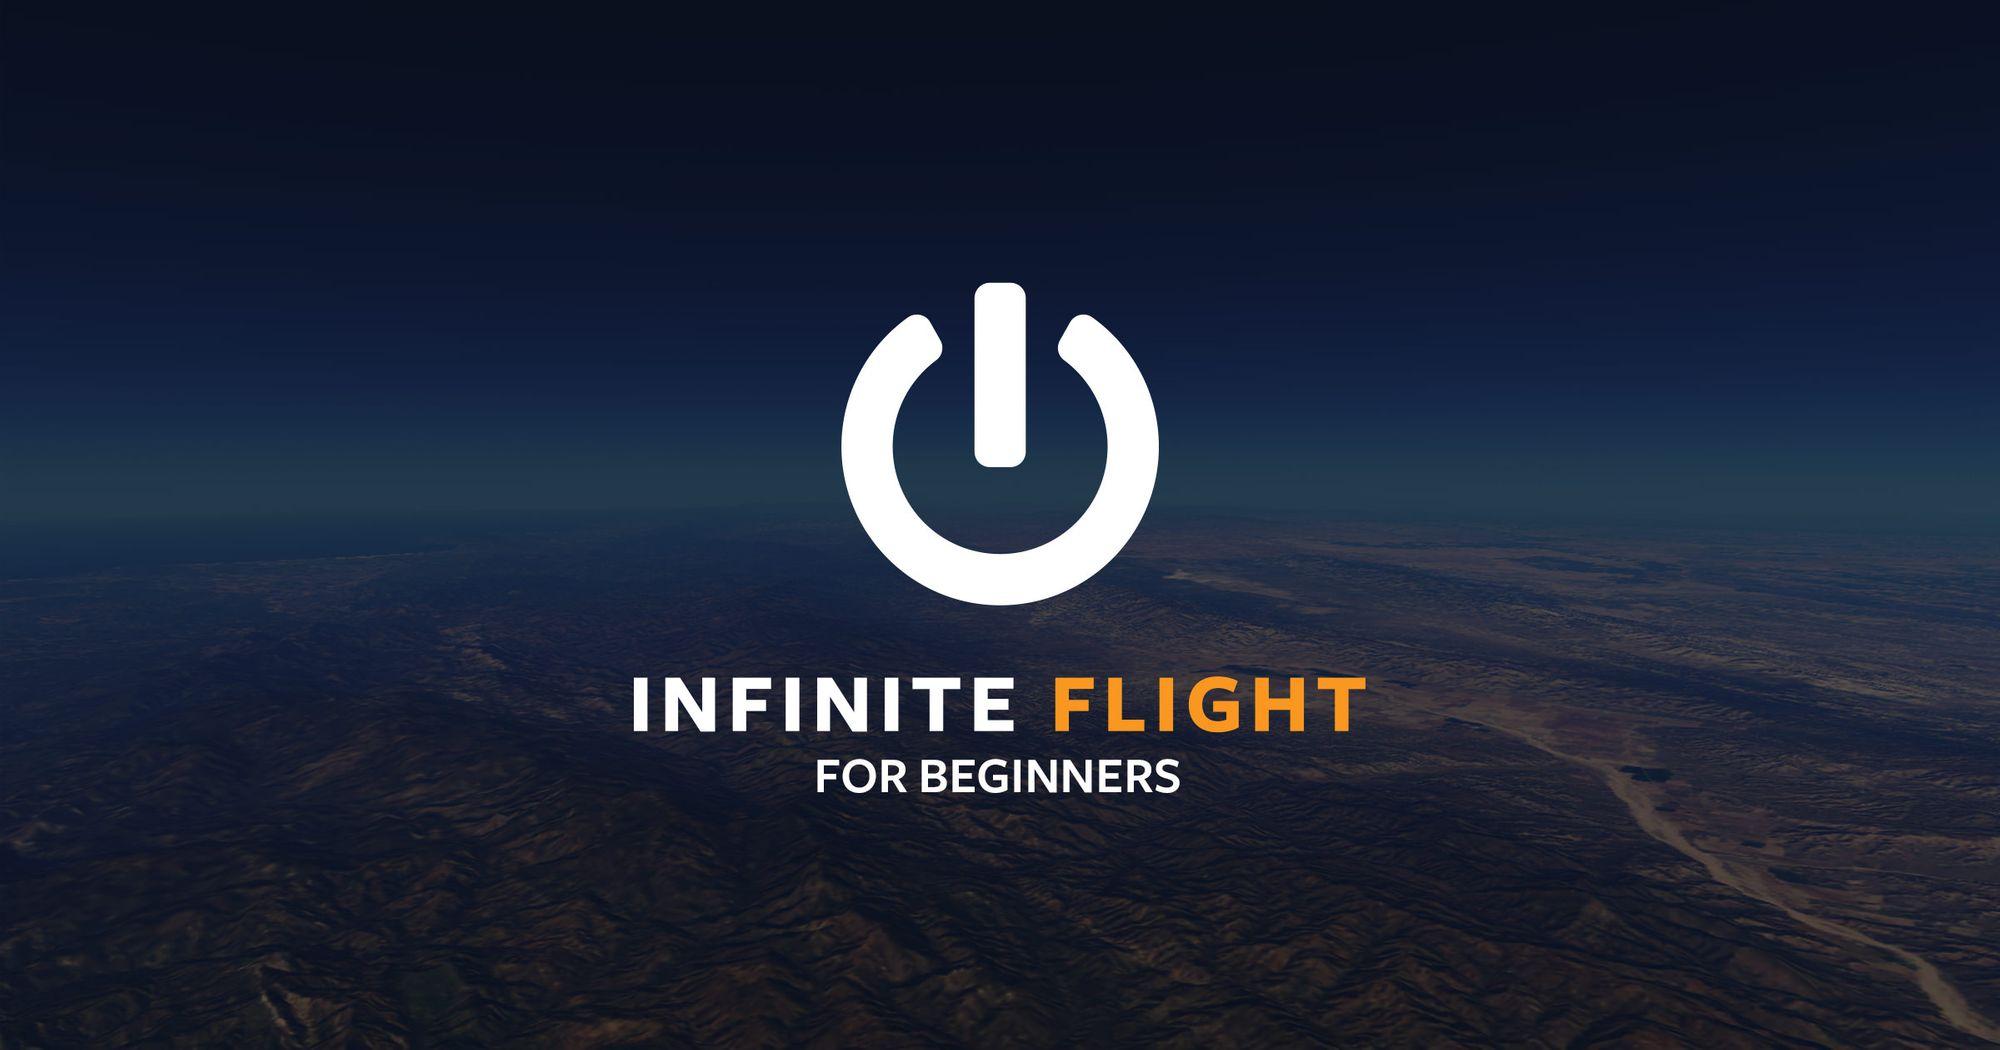 5 Tutorials To Watch For Infinite Flight Beginners